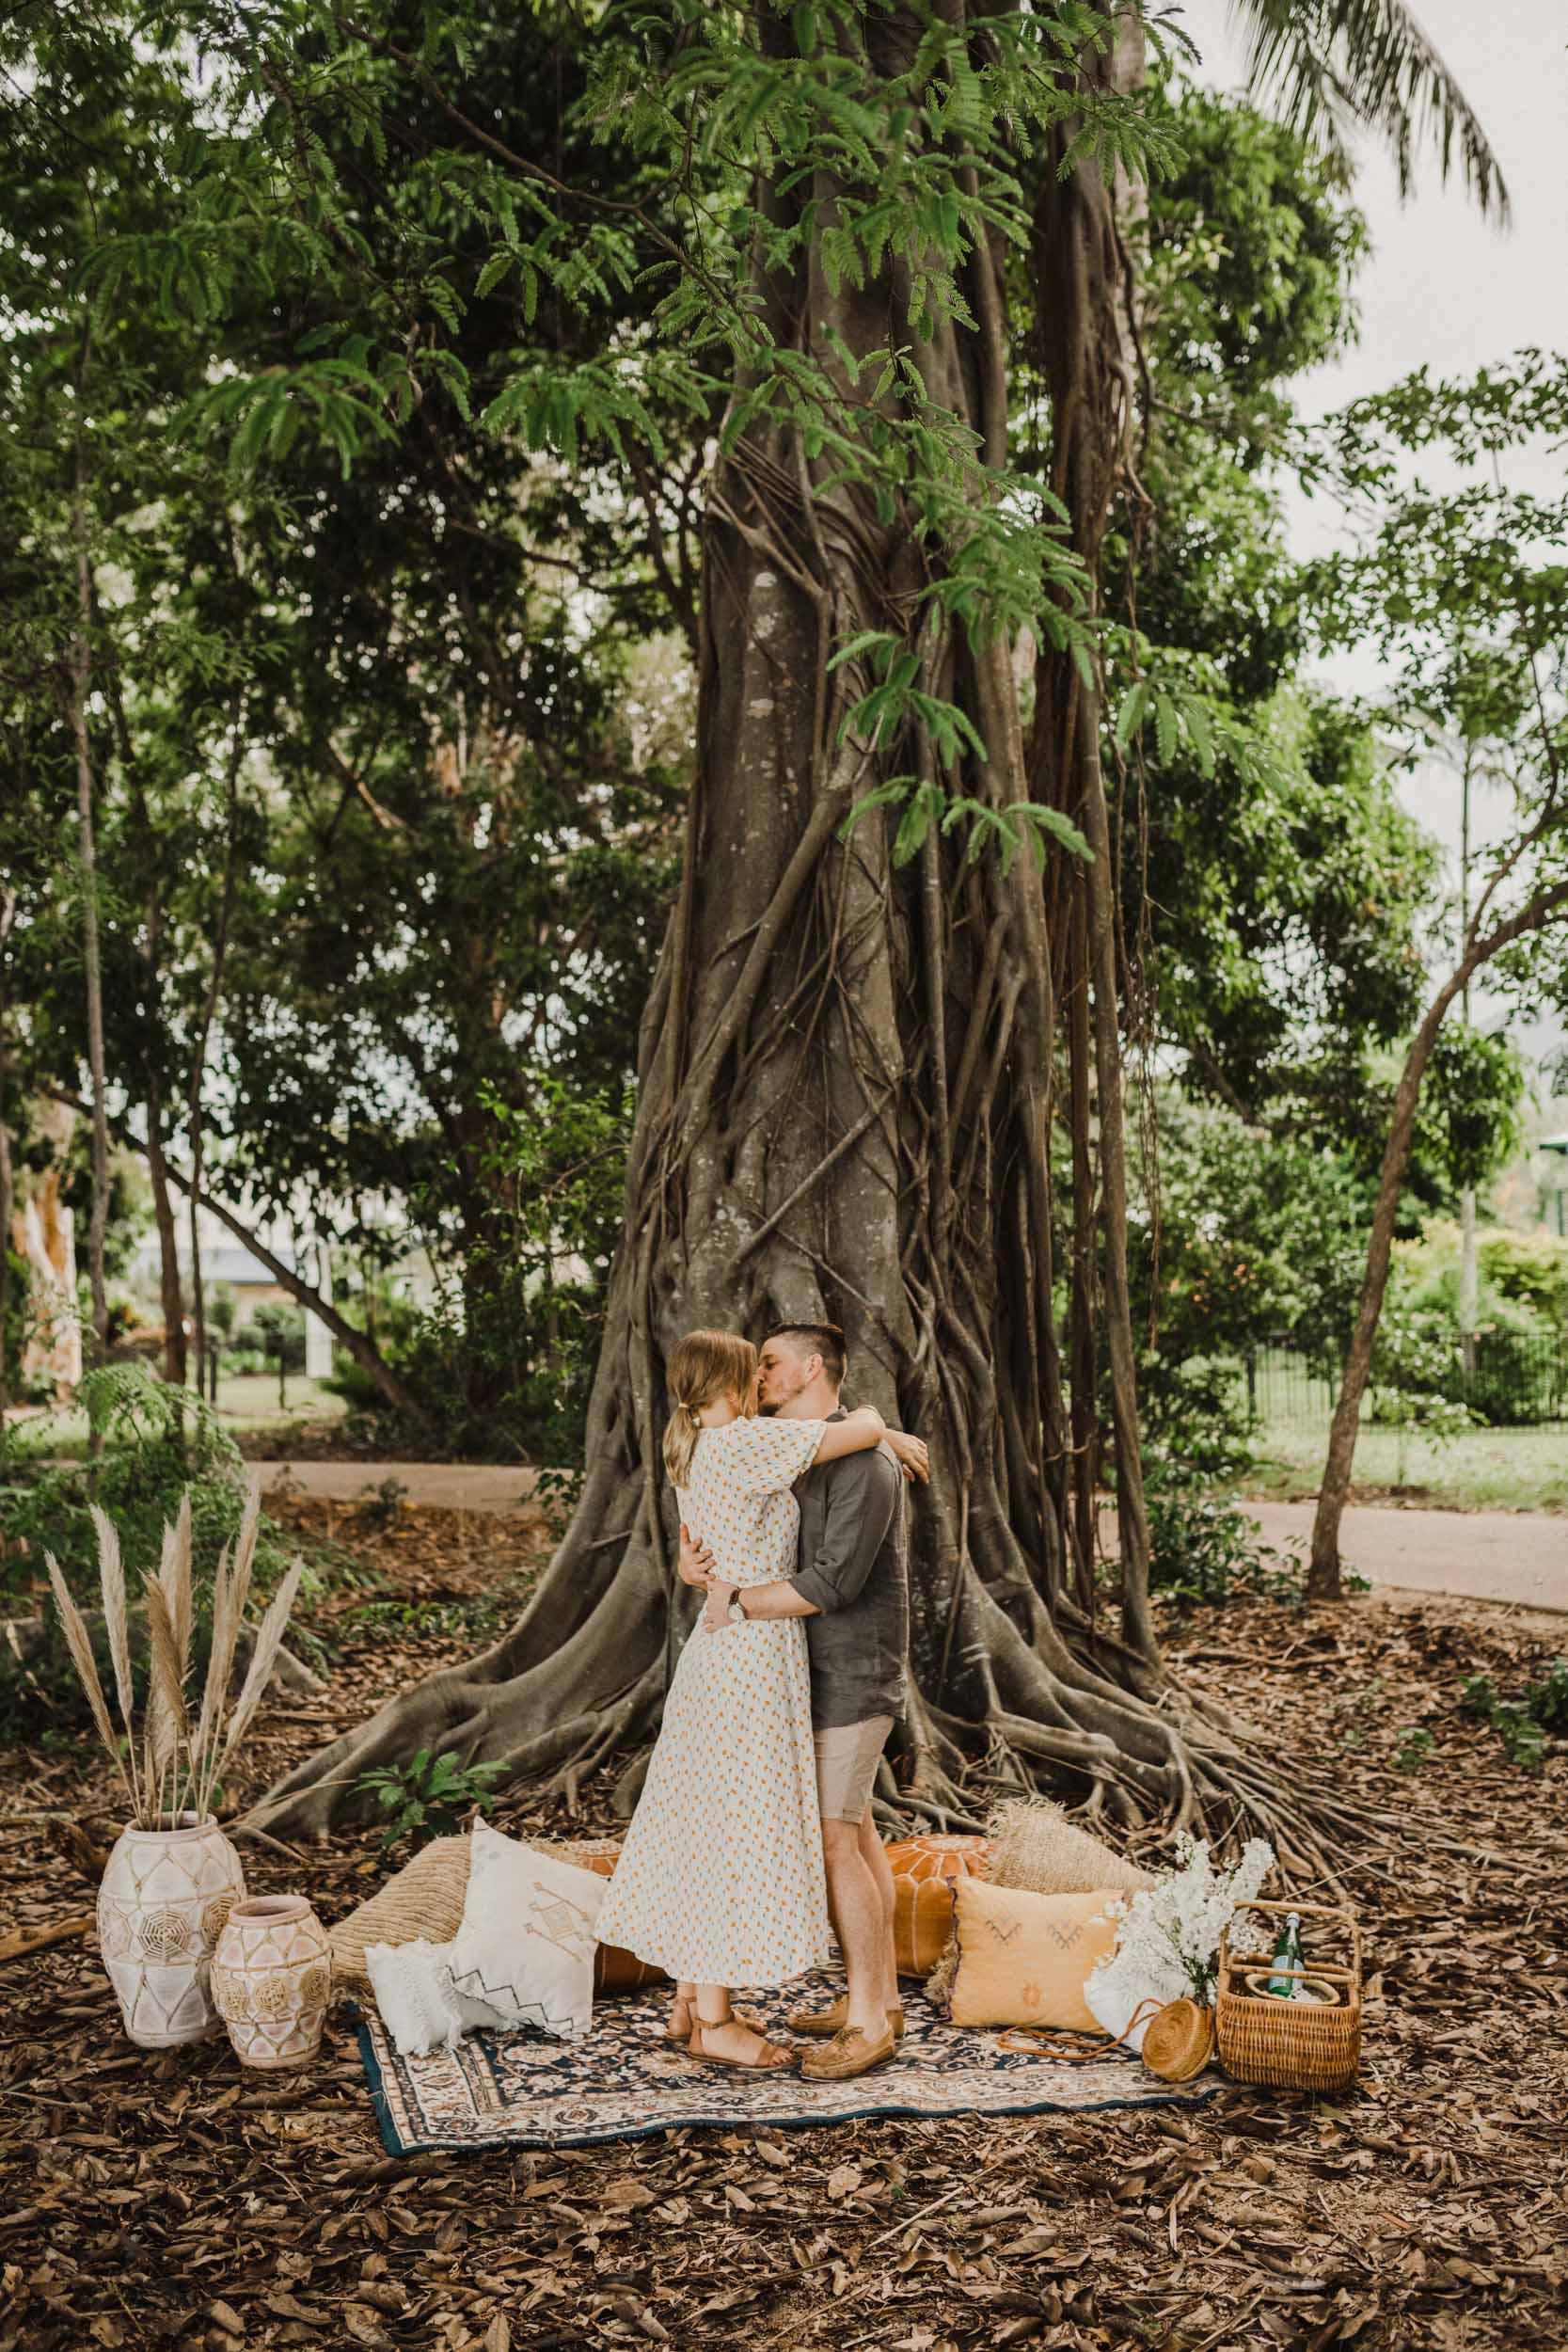 The Raw Photographer - Cairns Wedding Photographer - Beach Engagement Shoot - Candid Picnic-21.jpg